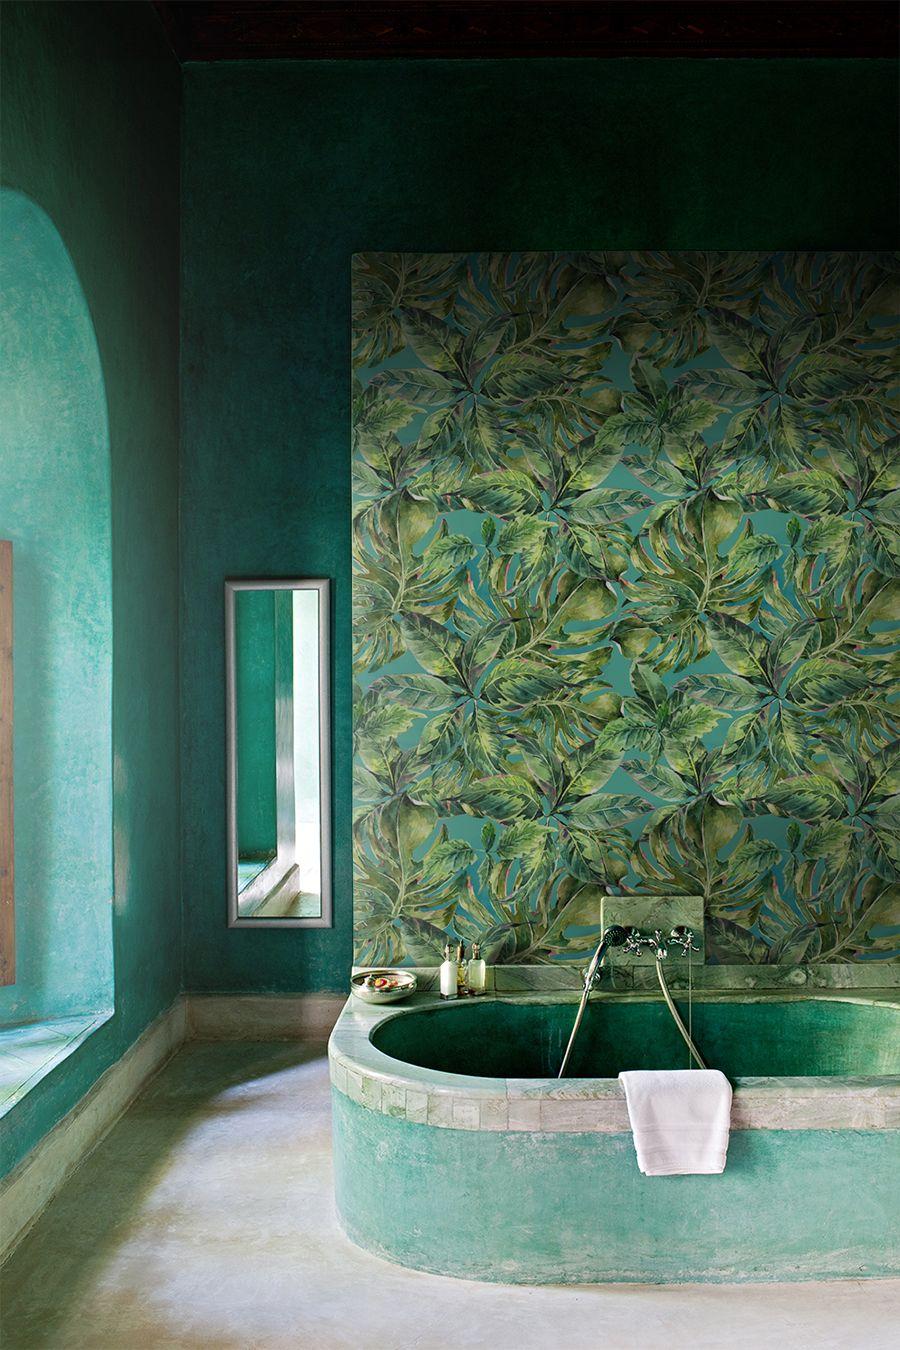 amazon rainforest removable wallpaper flower mural on bathroom wall decor id=11406